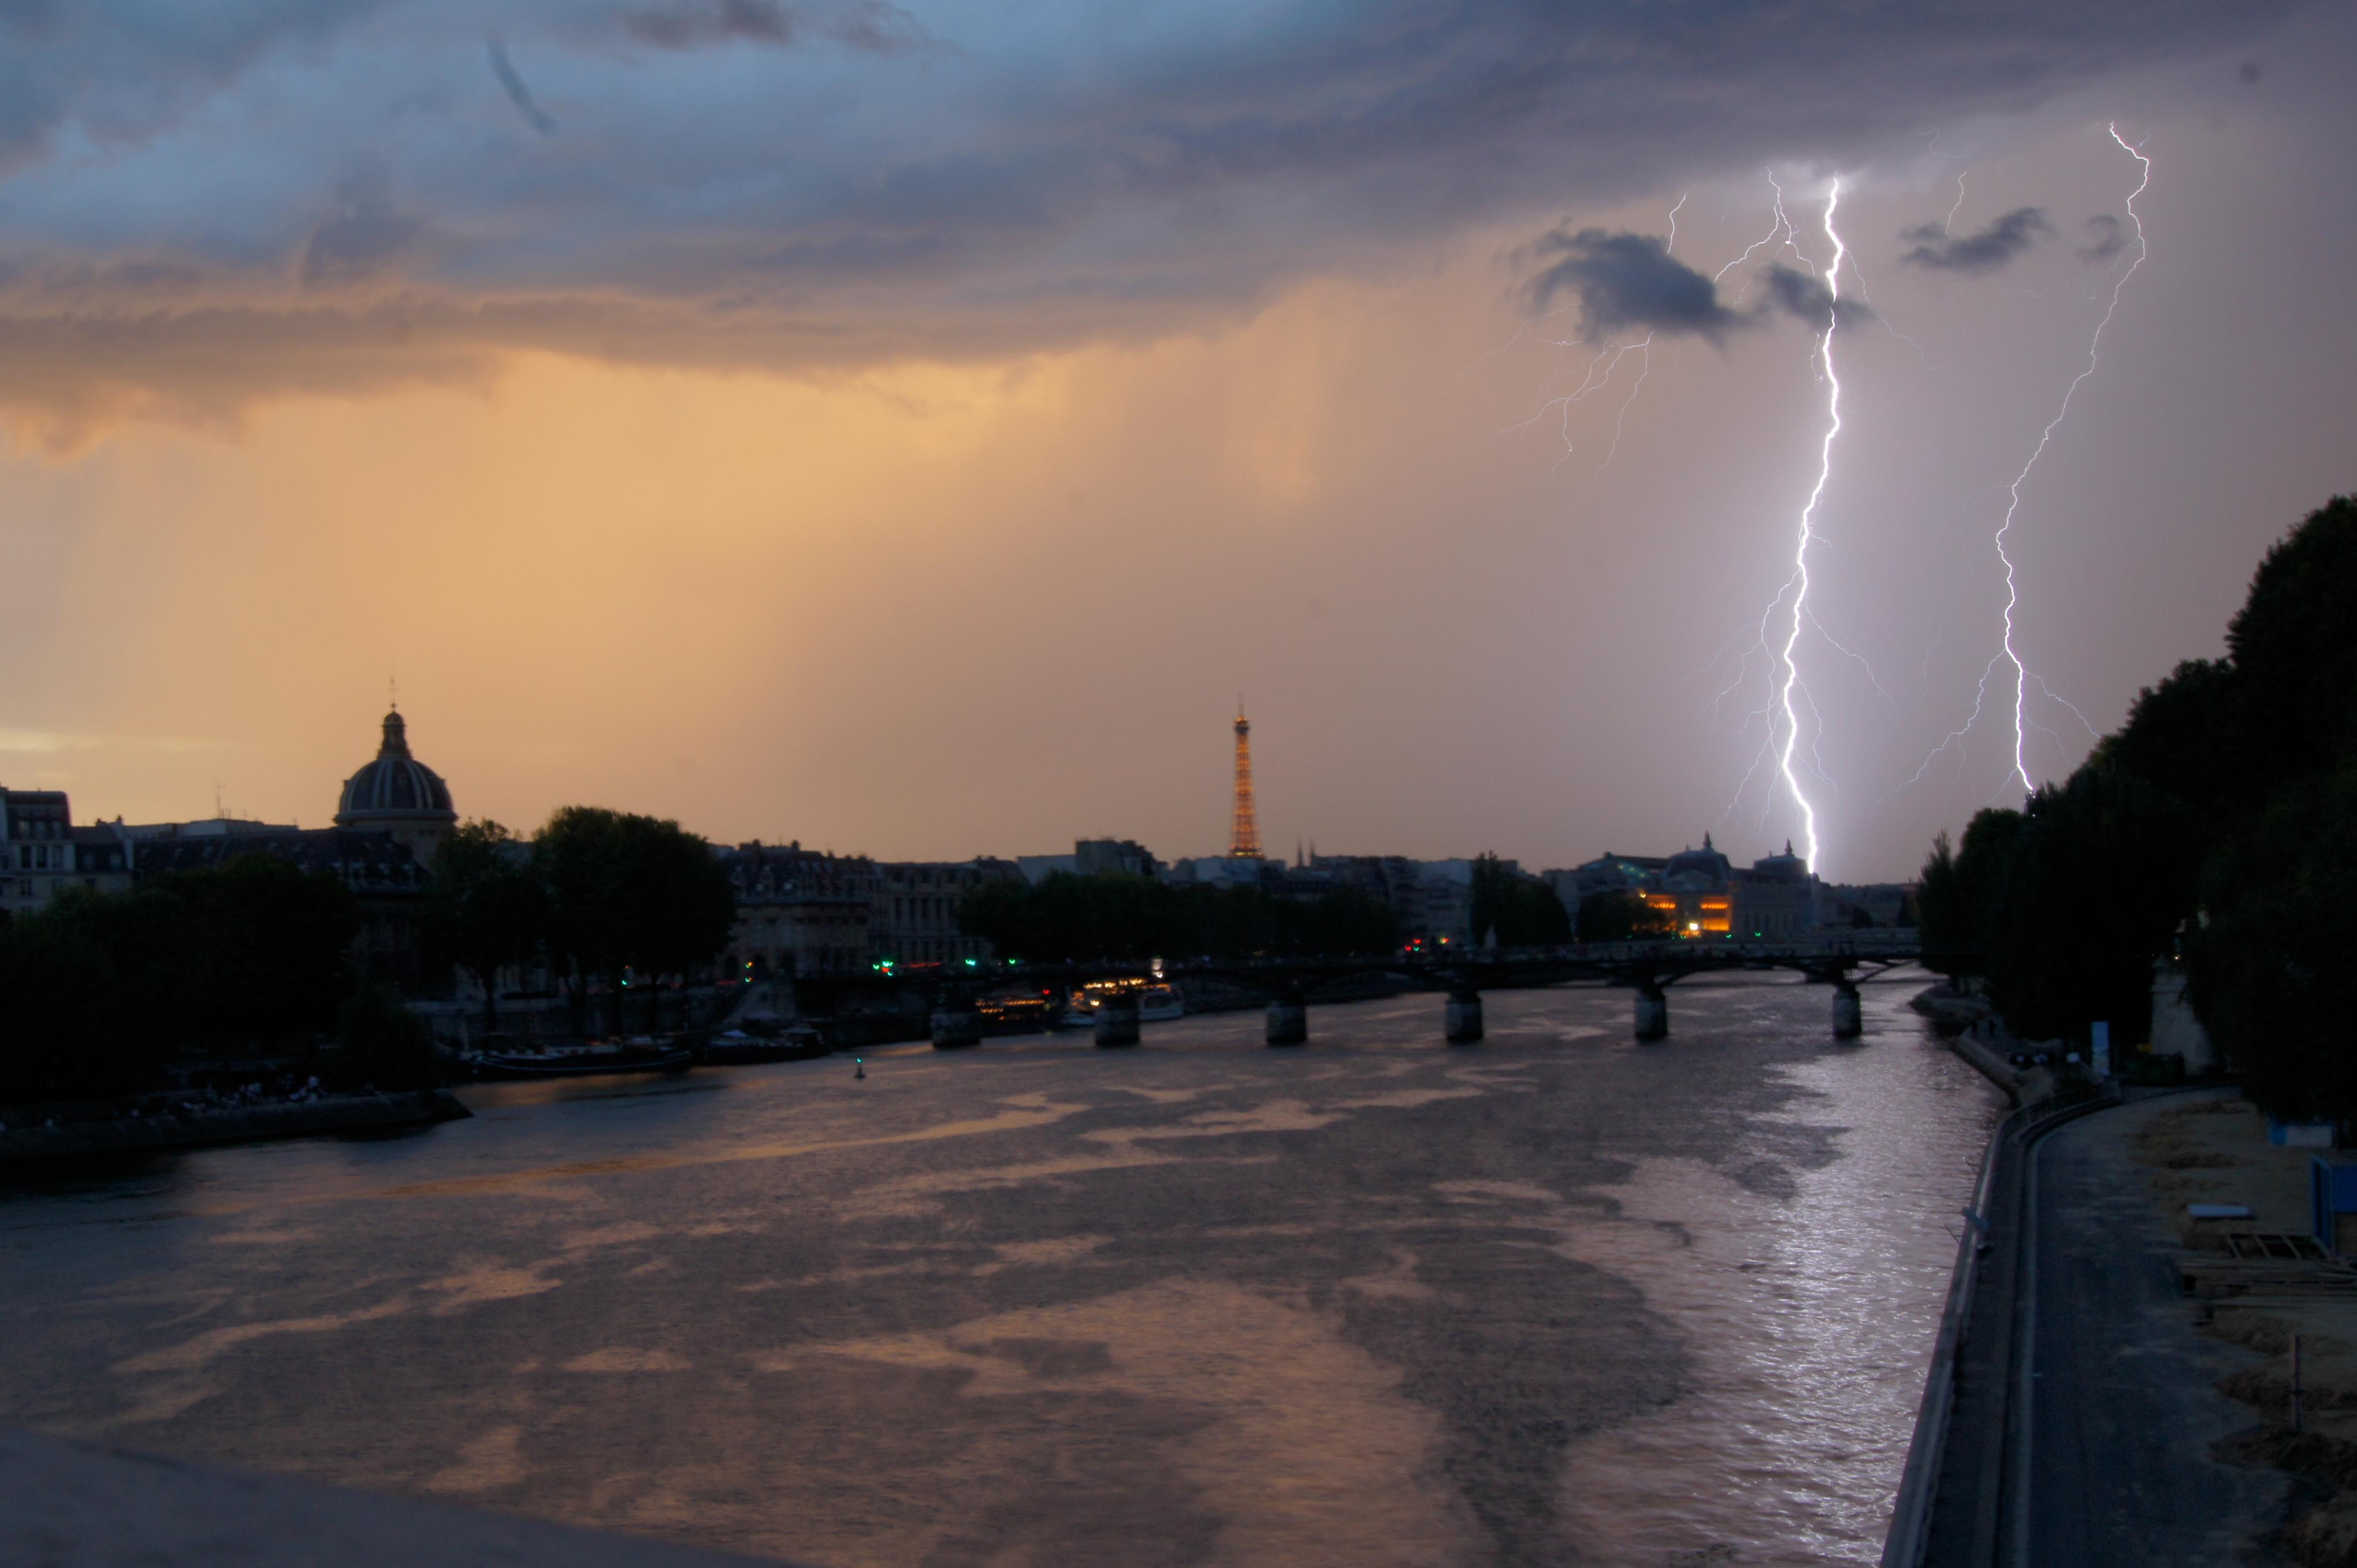 Thunderstorm in Paris, France.